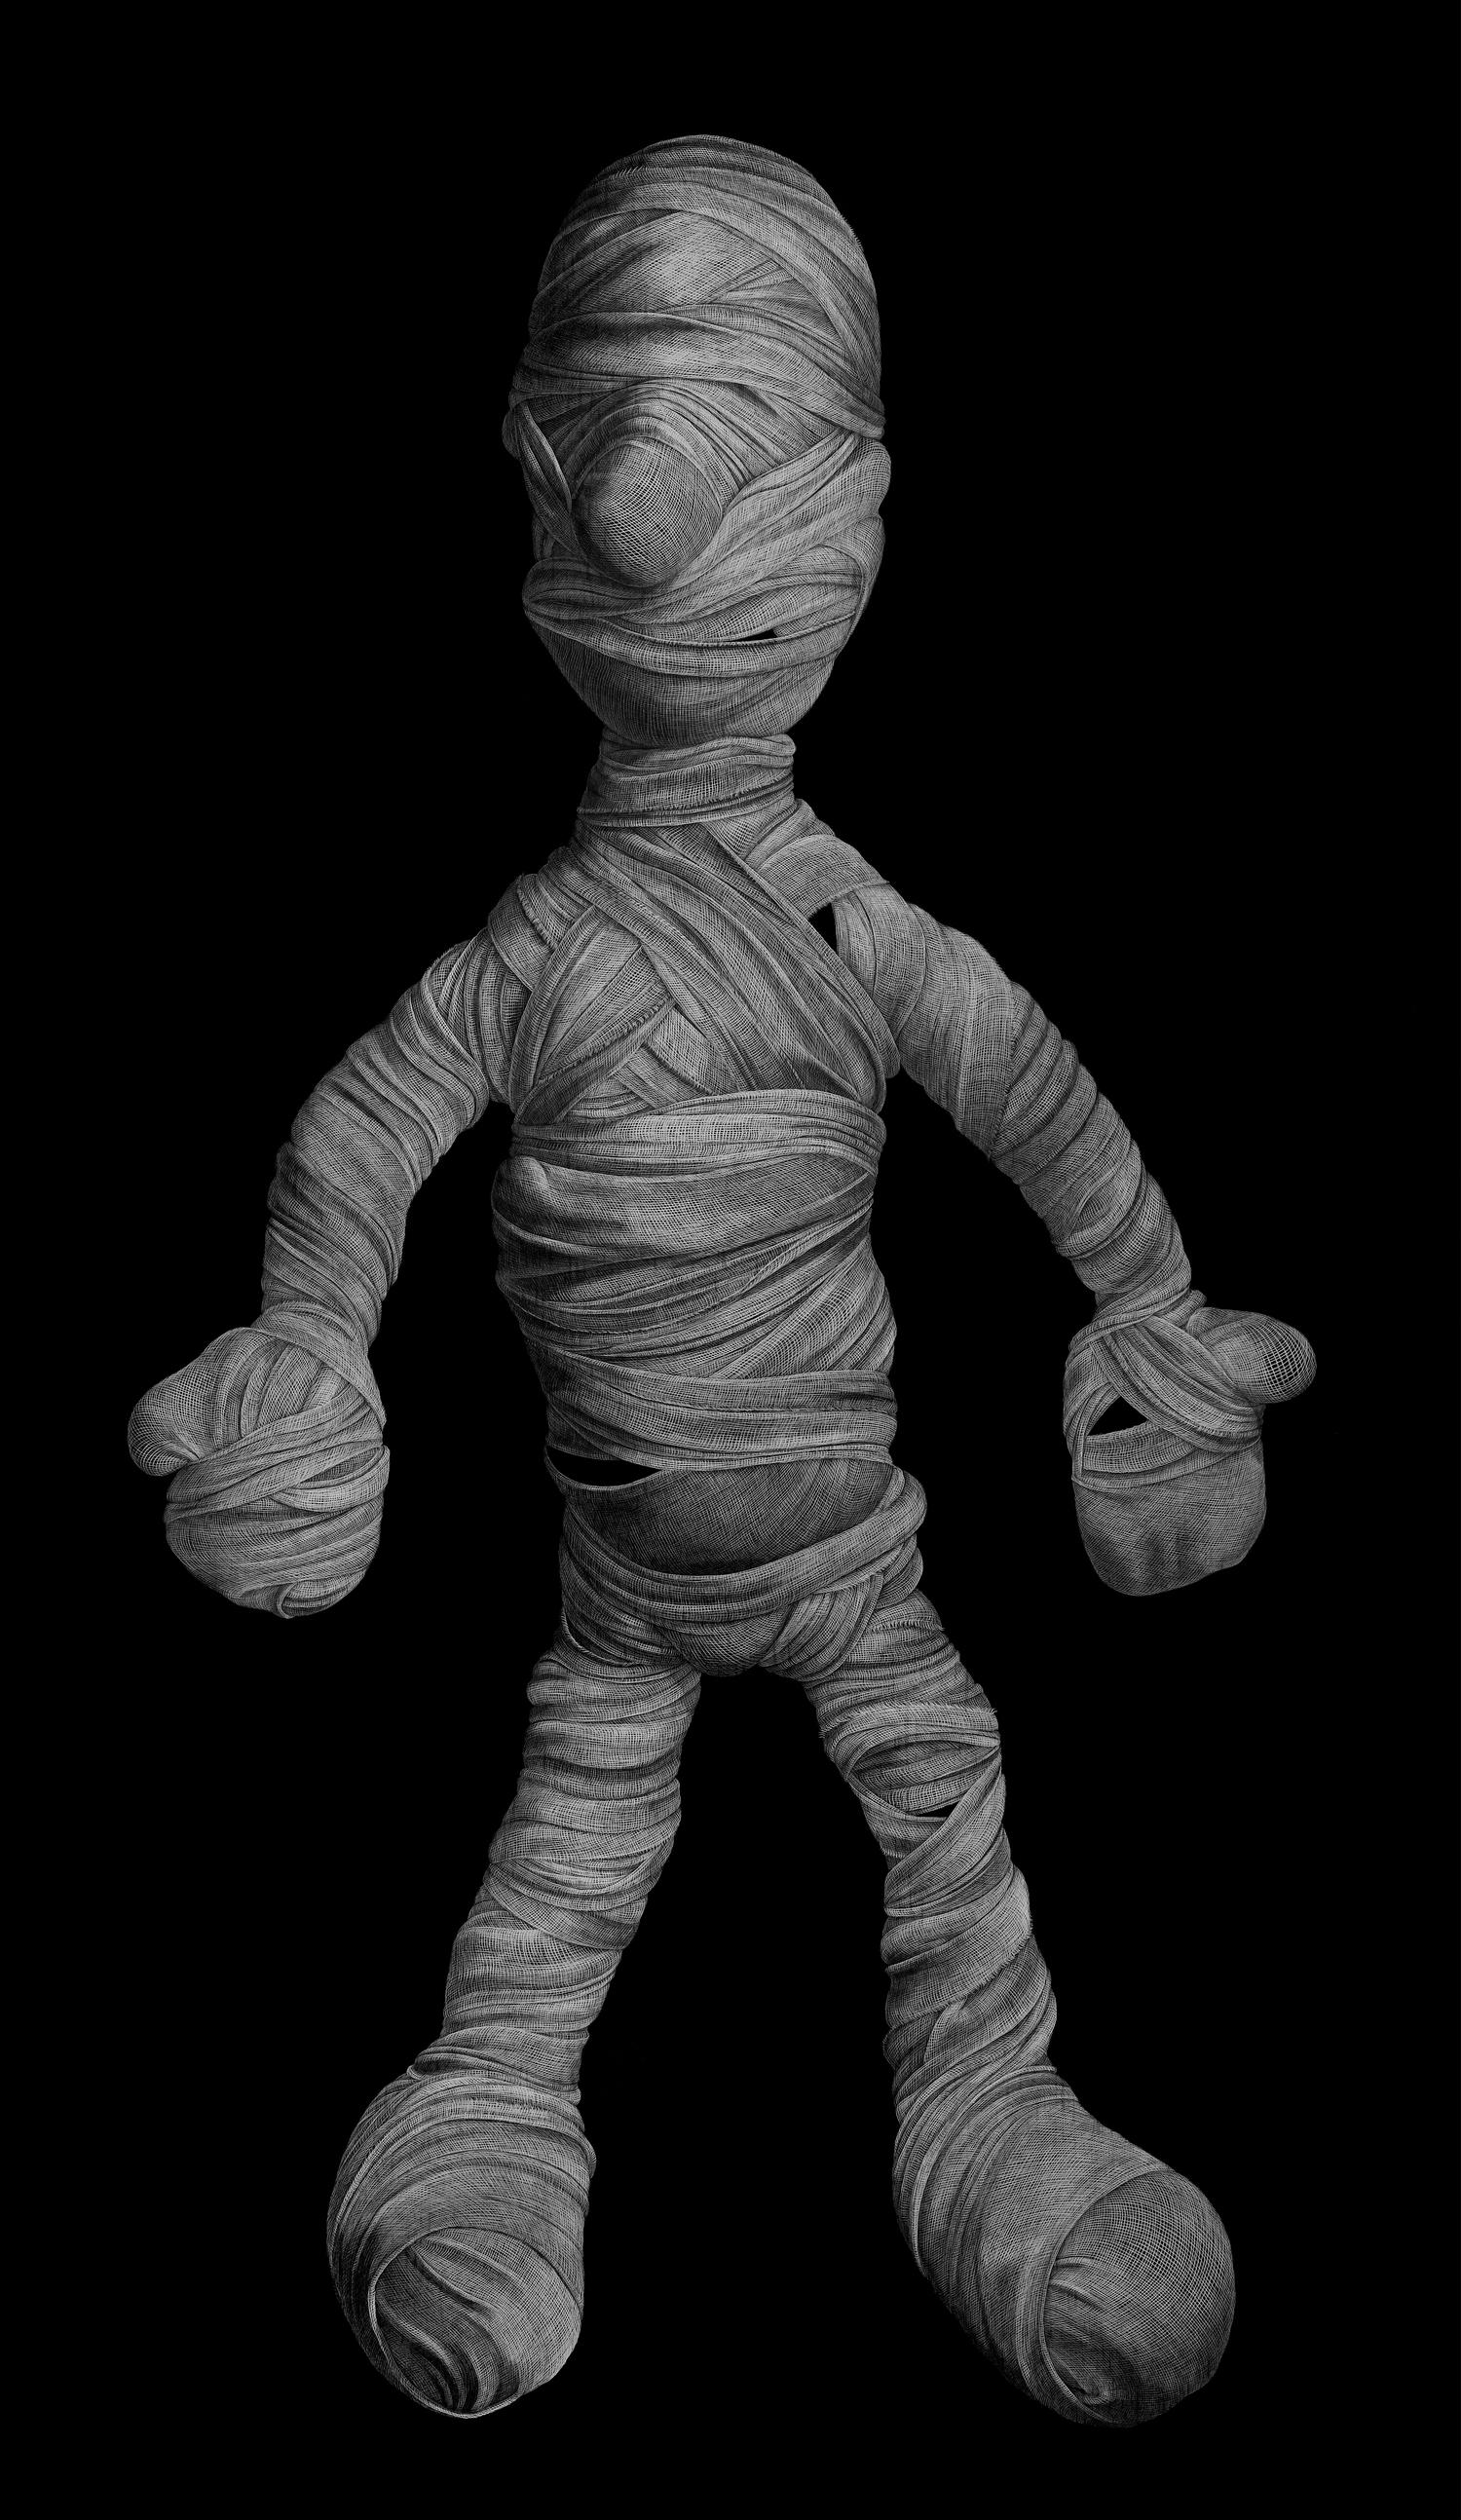 Protagonist (Human)  2013 Engraved drawing on vinyl 244 x 165 cm